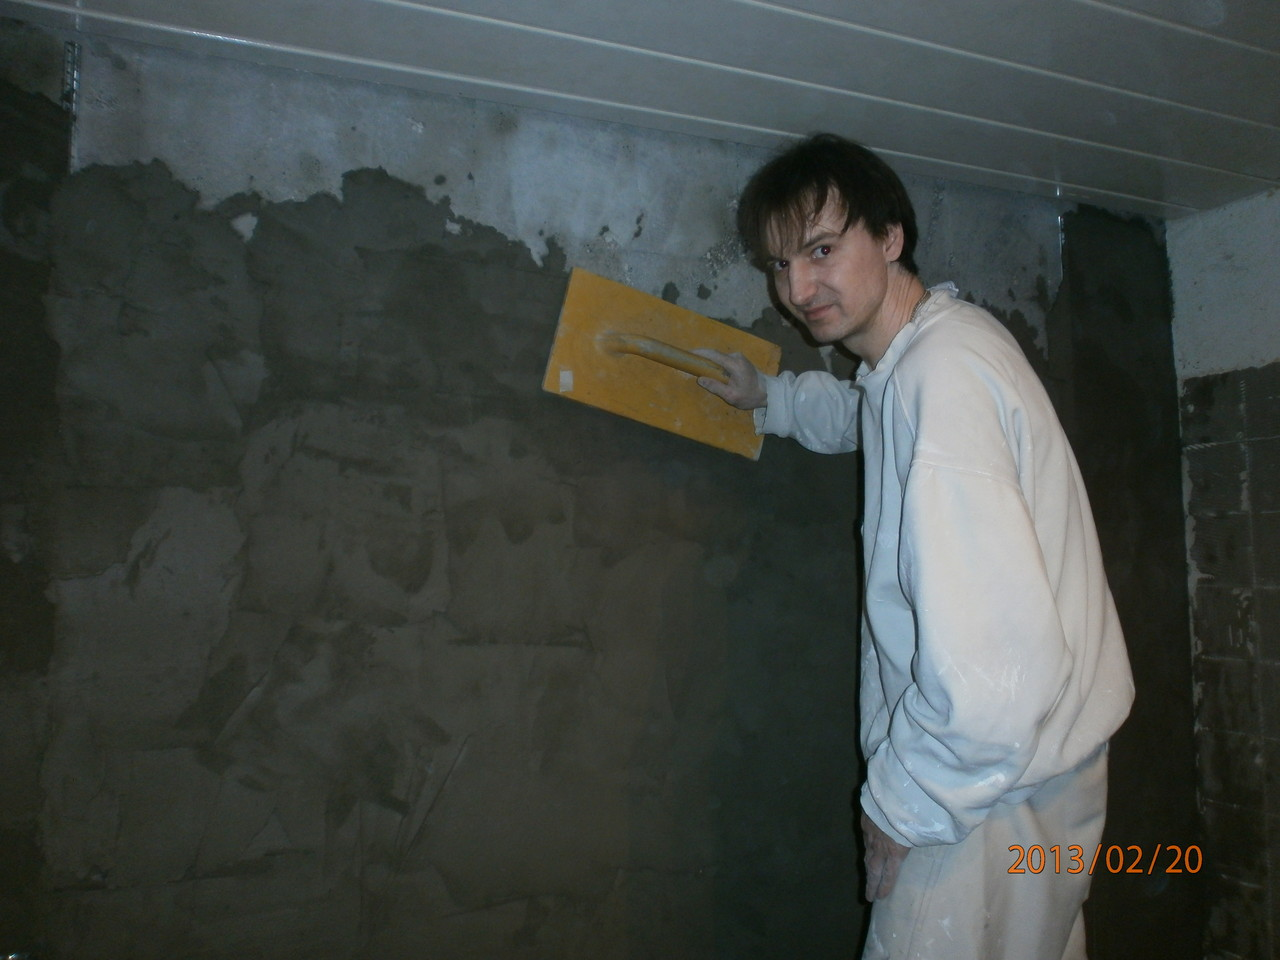 Favorit Referenzen - Loeper Fliesenleger Gelsenkirchen JU69